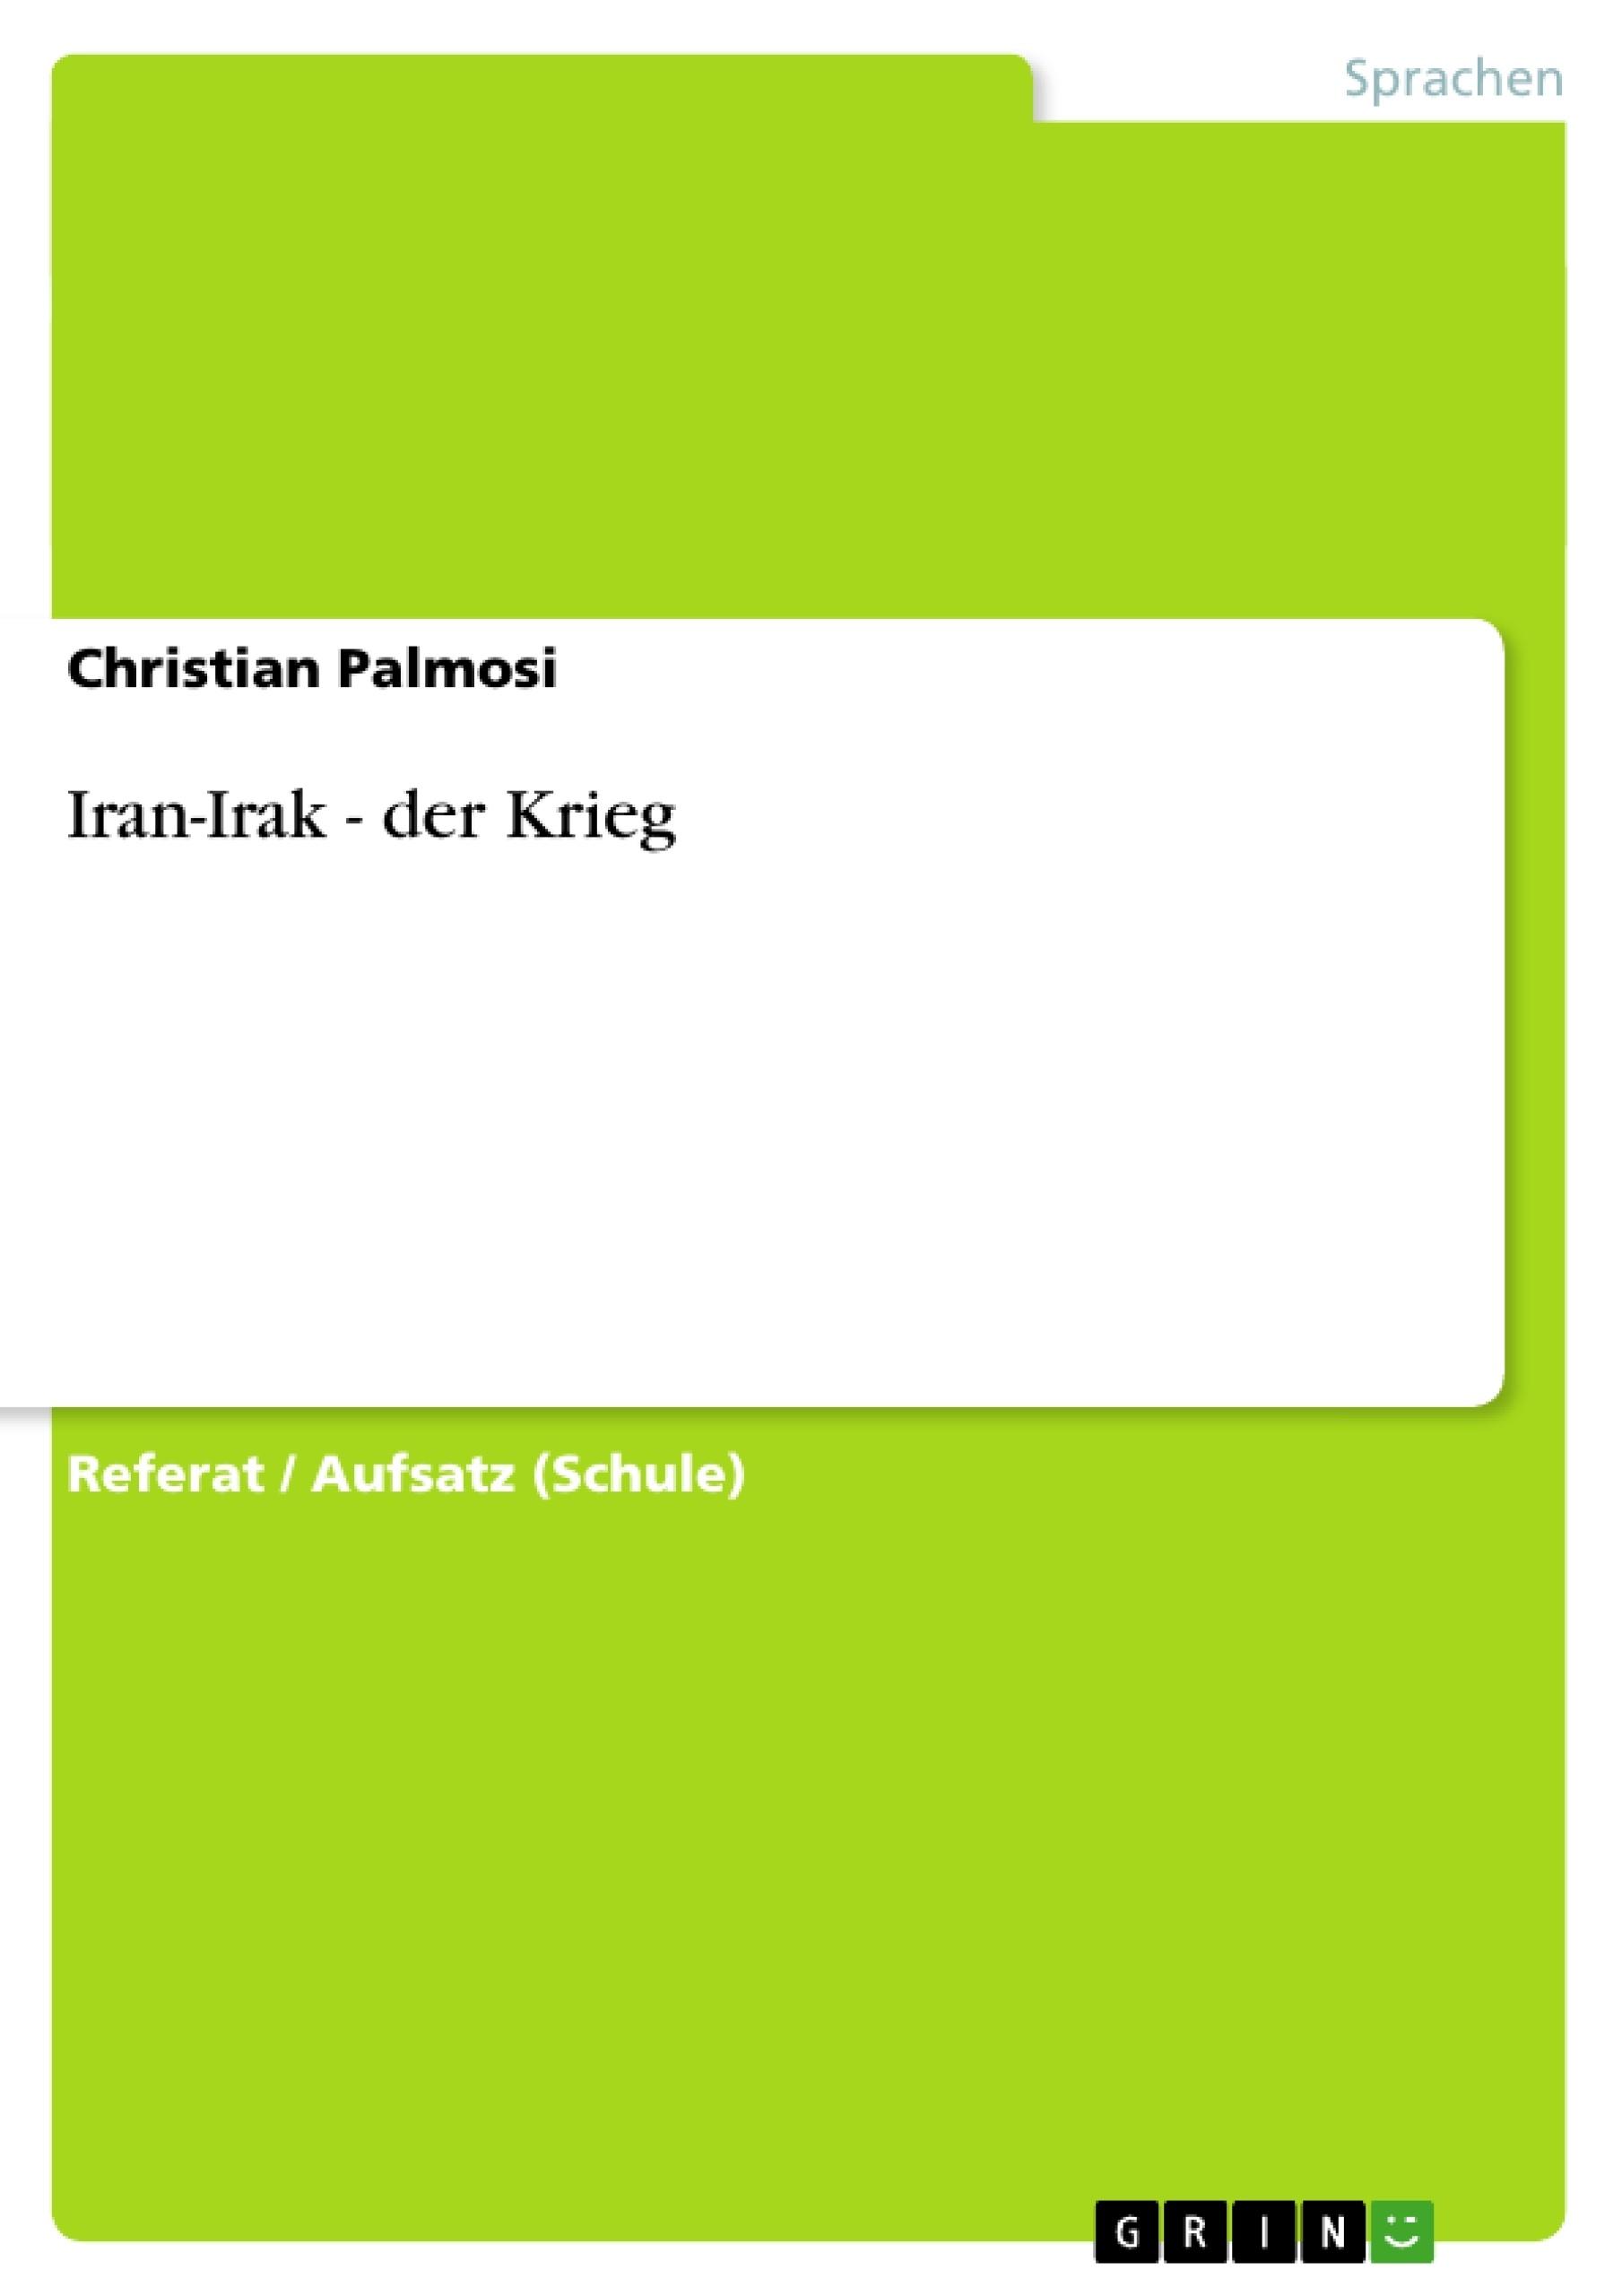 Titel: Iran-Irak - der Krieg